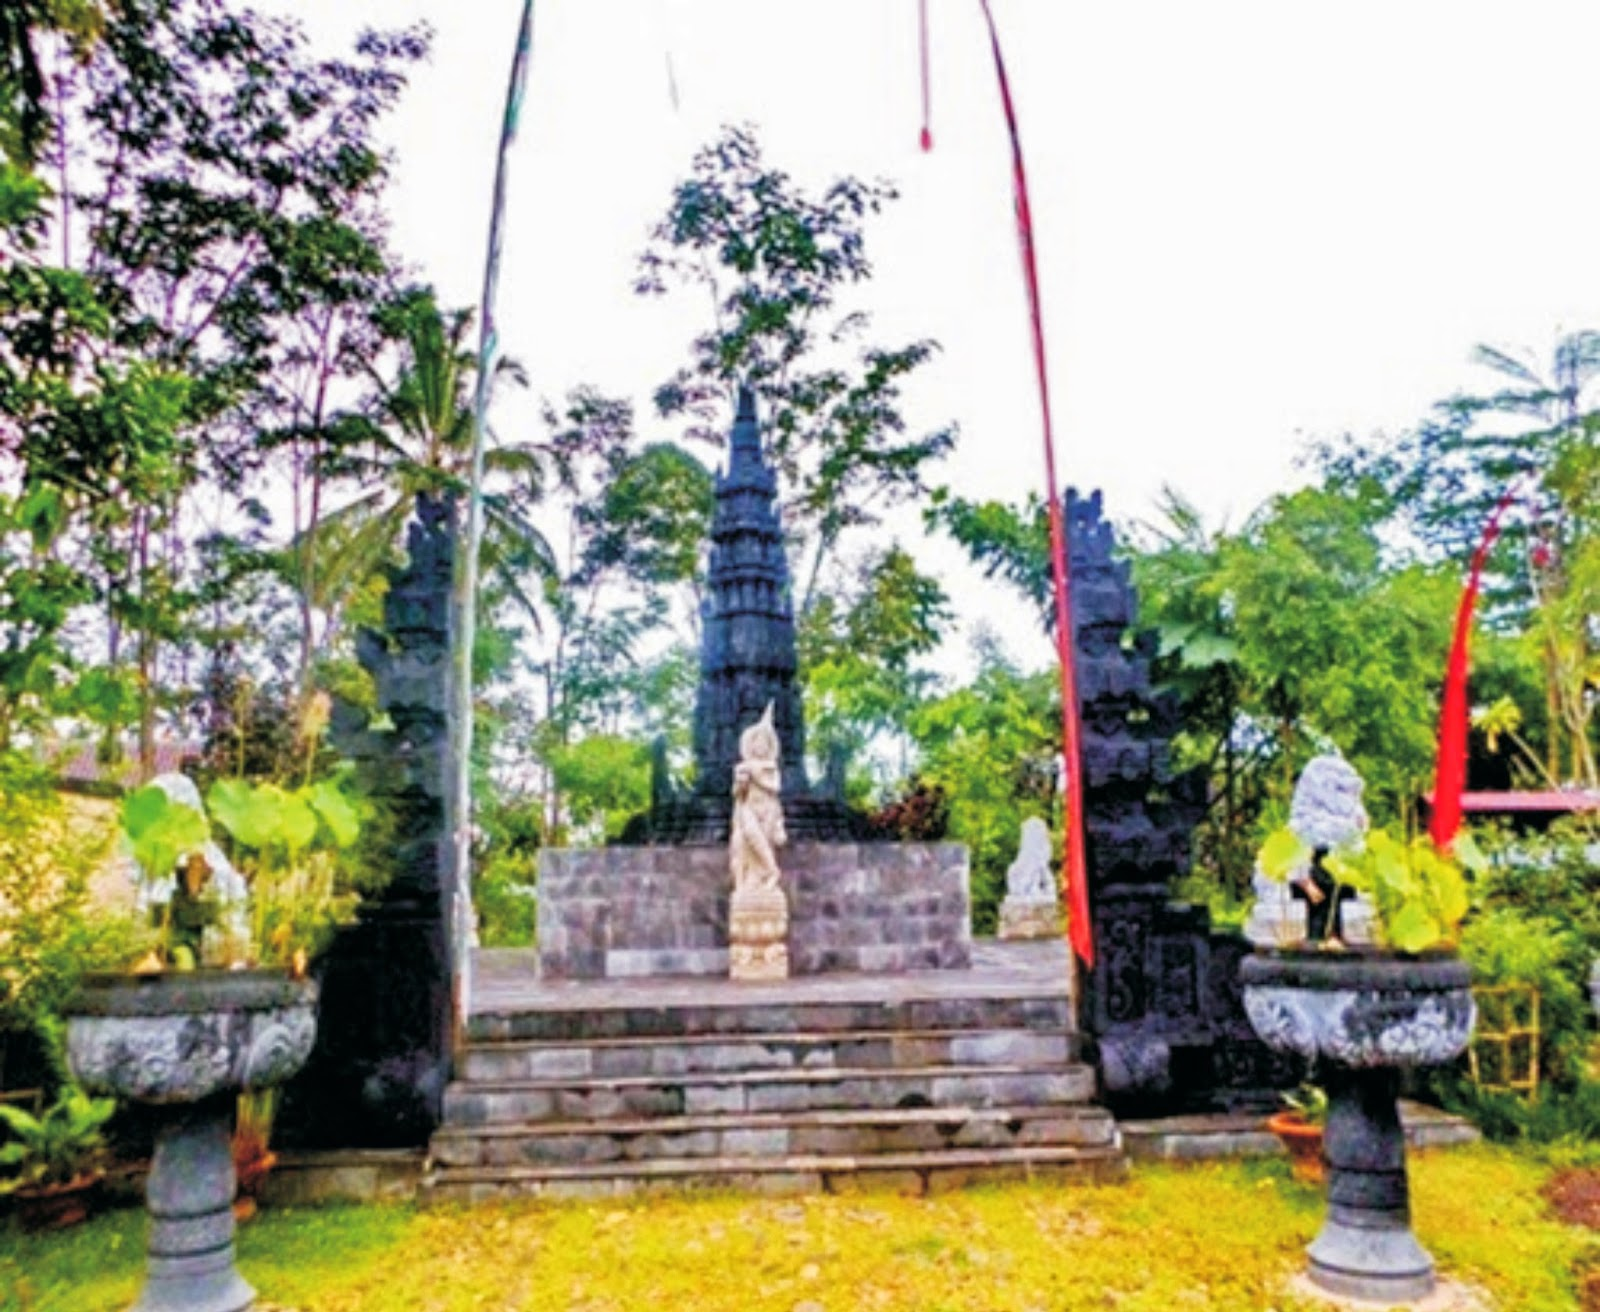 Iinformasi Lengkap Kampung Bali Cibatu Garut Fasilitas